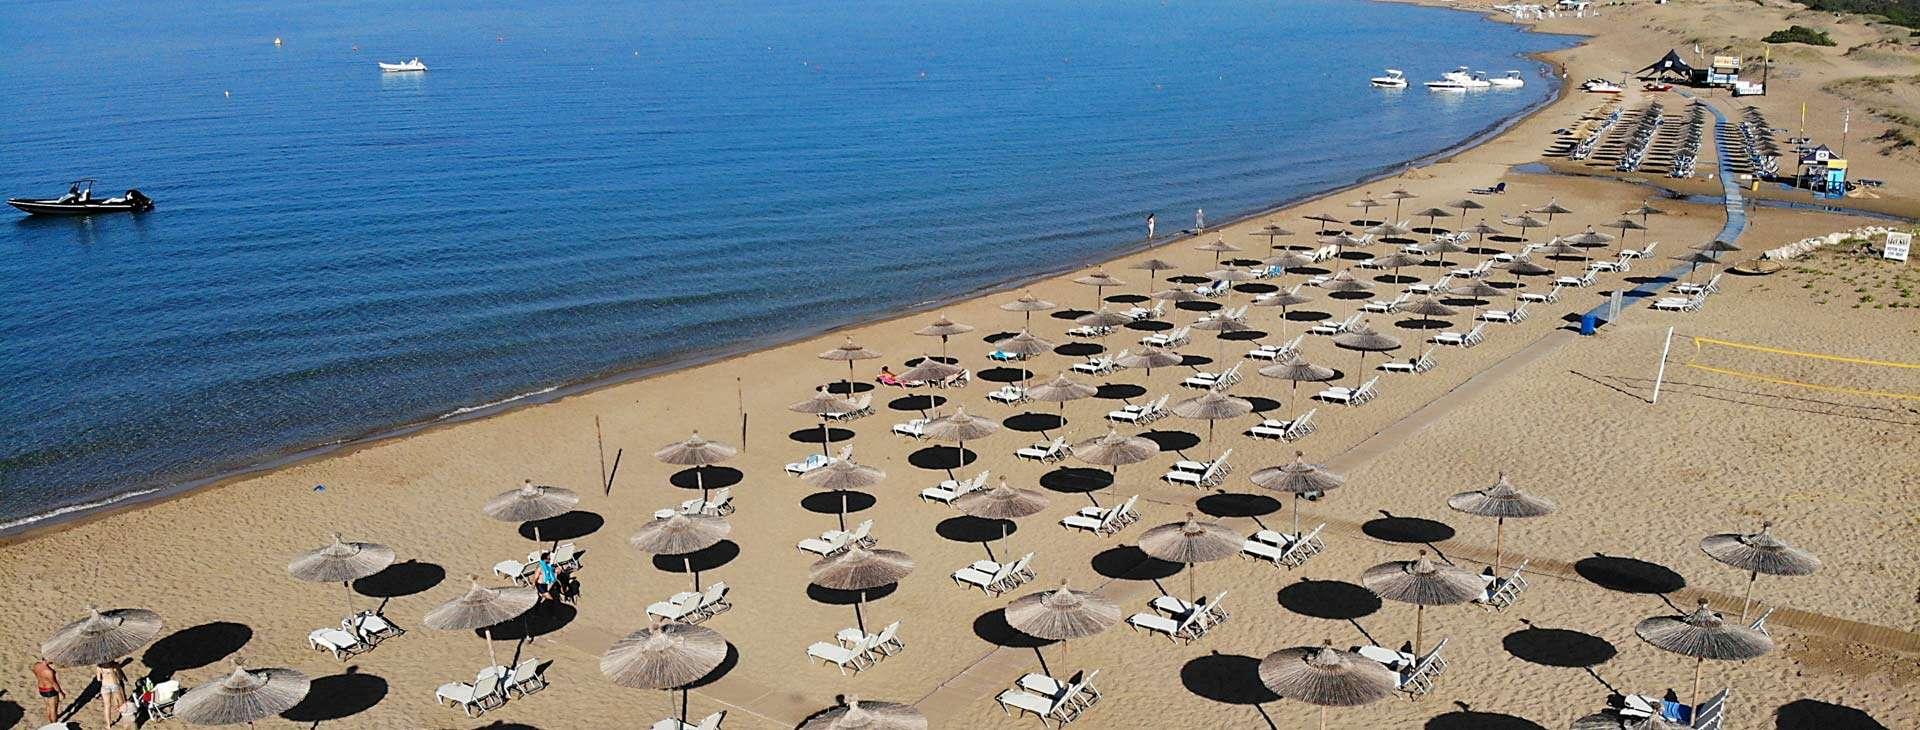 Labranda Sandy Beach (ex Aquis Sandy Beach) - basen